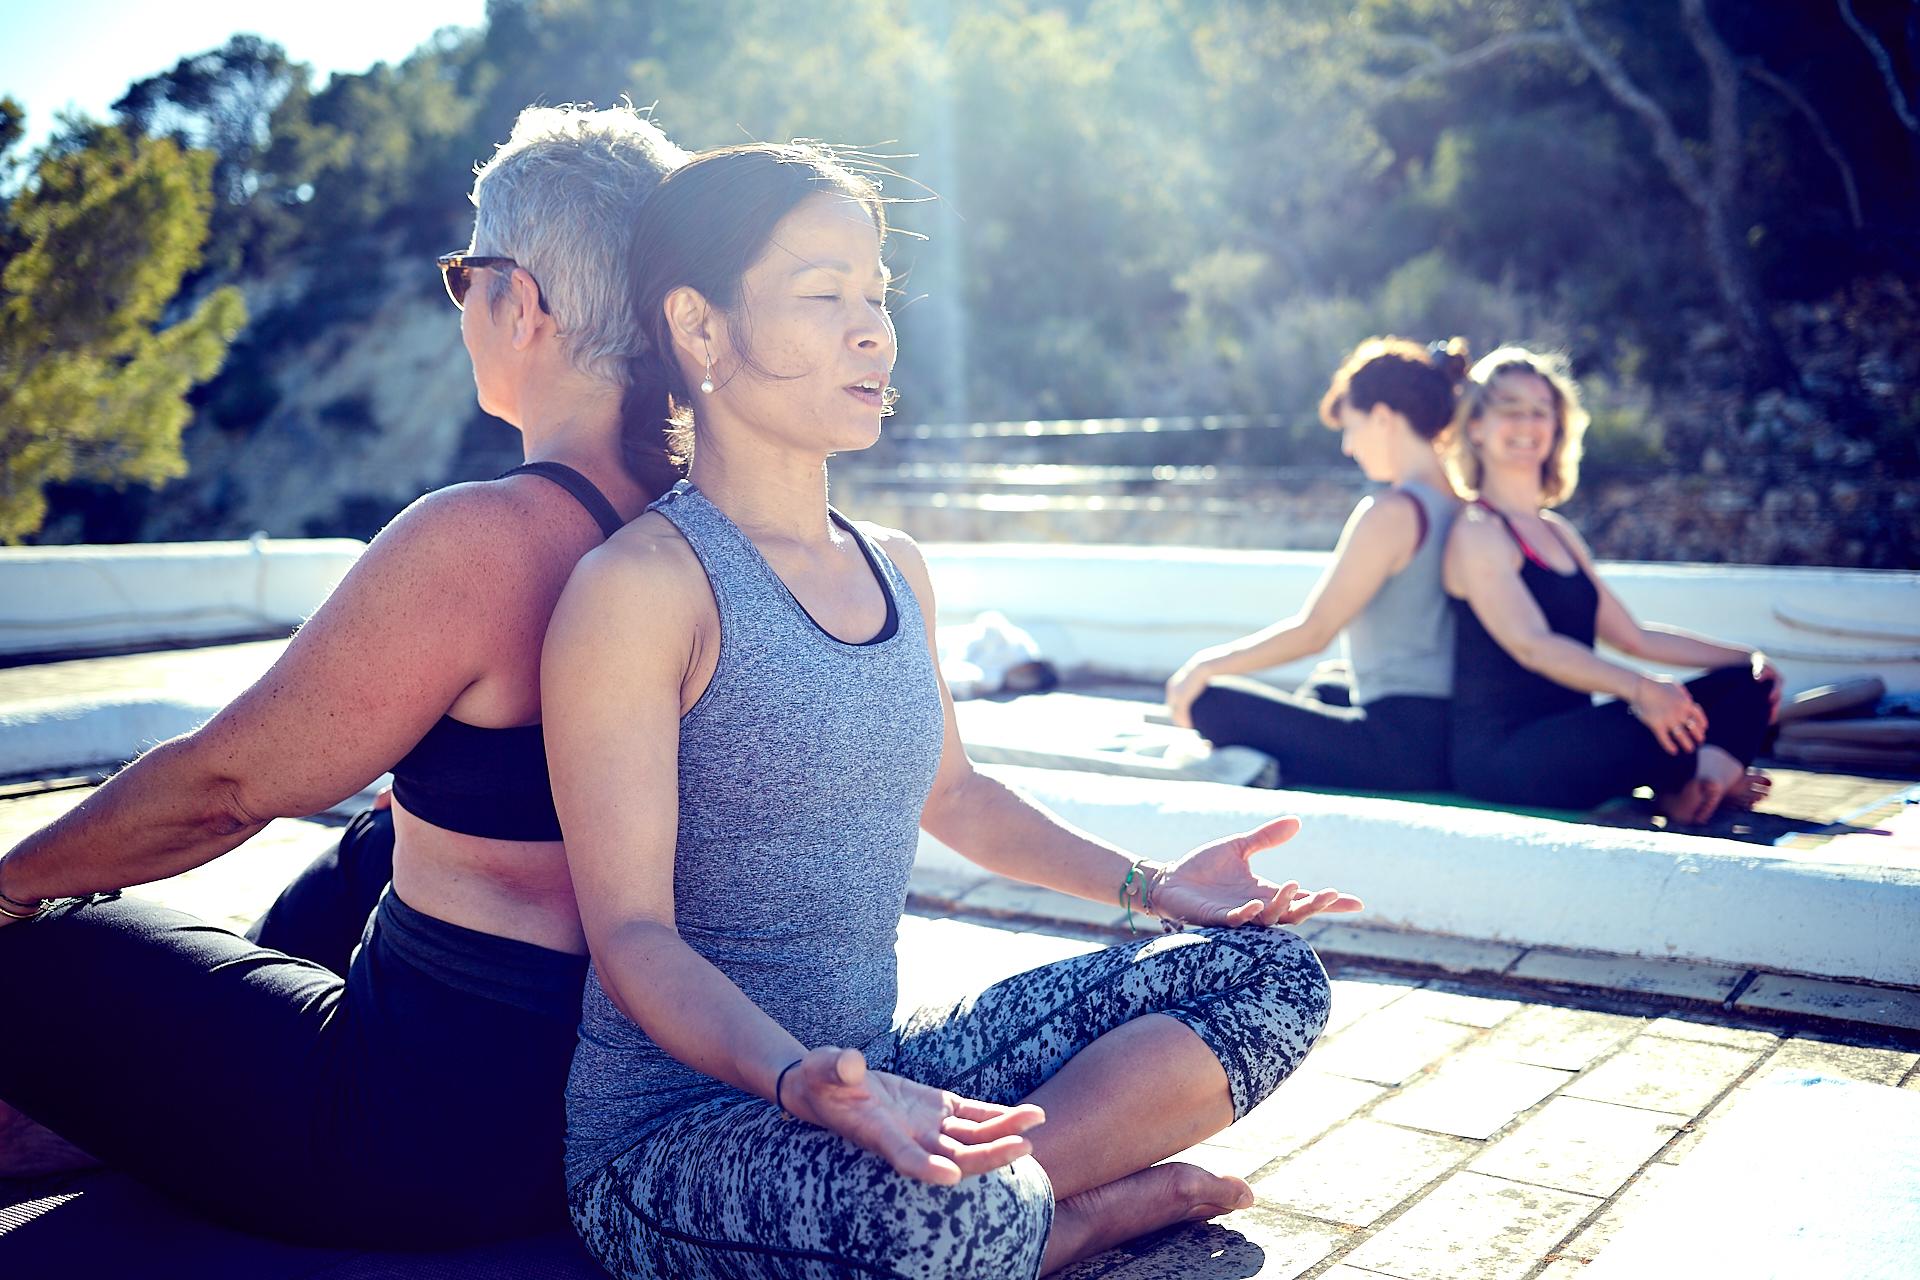 YogaTrip_1073_Maï_ibiza_benedicte_Brocard_duo-femmes-yoga-seance-institutrice-terrasse-soleil-position